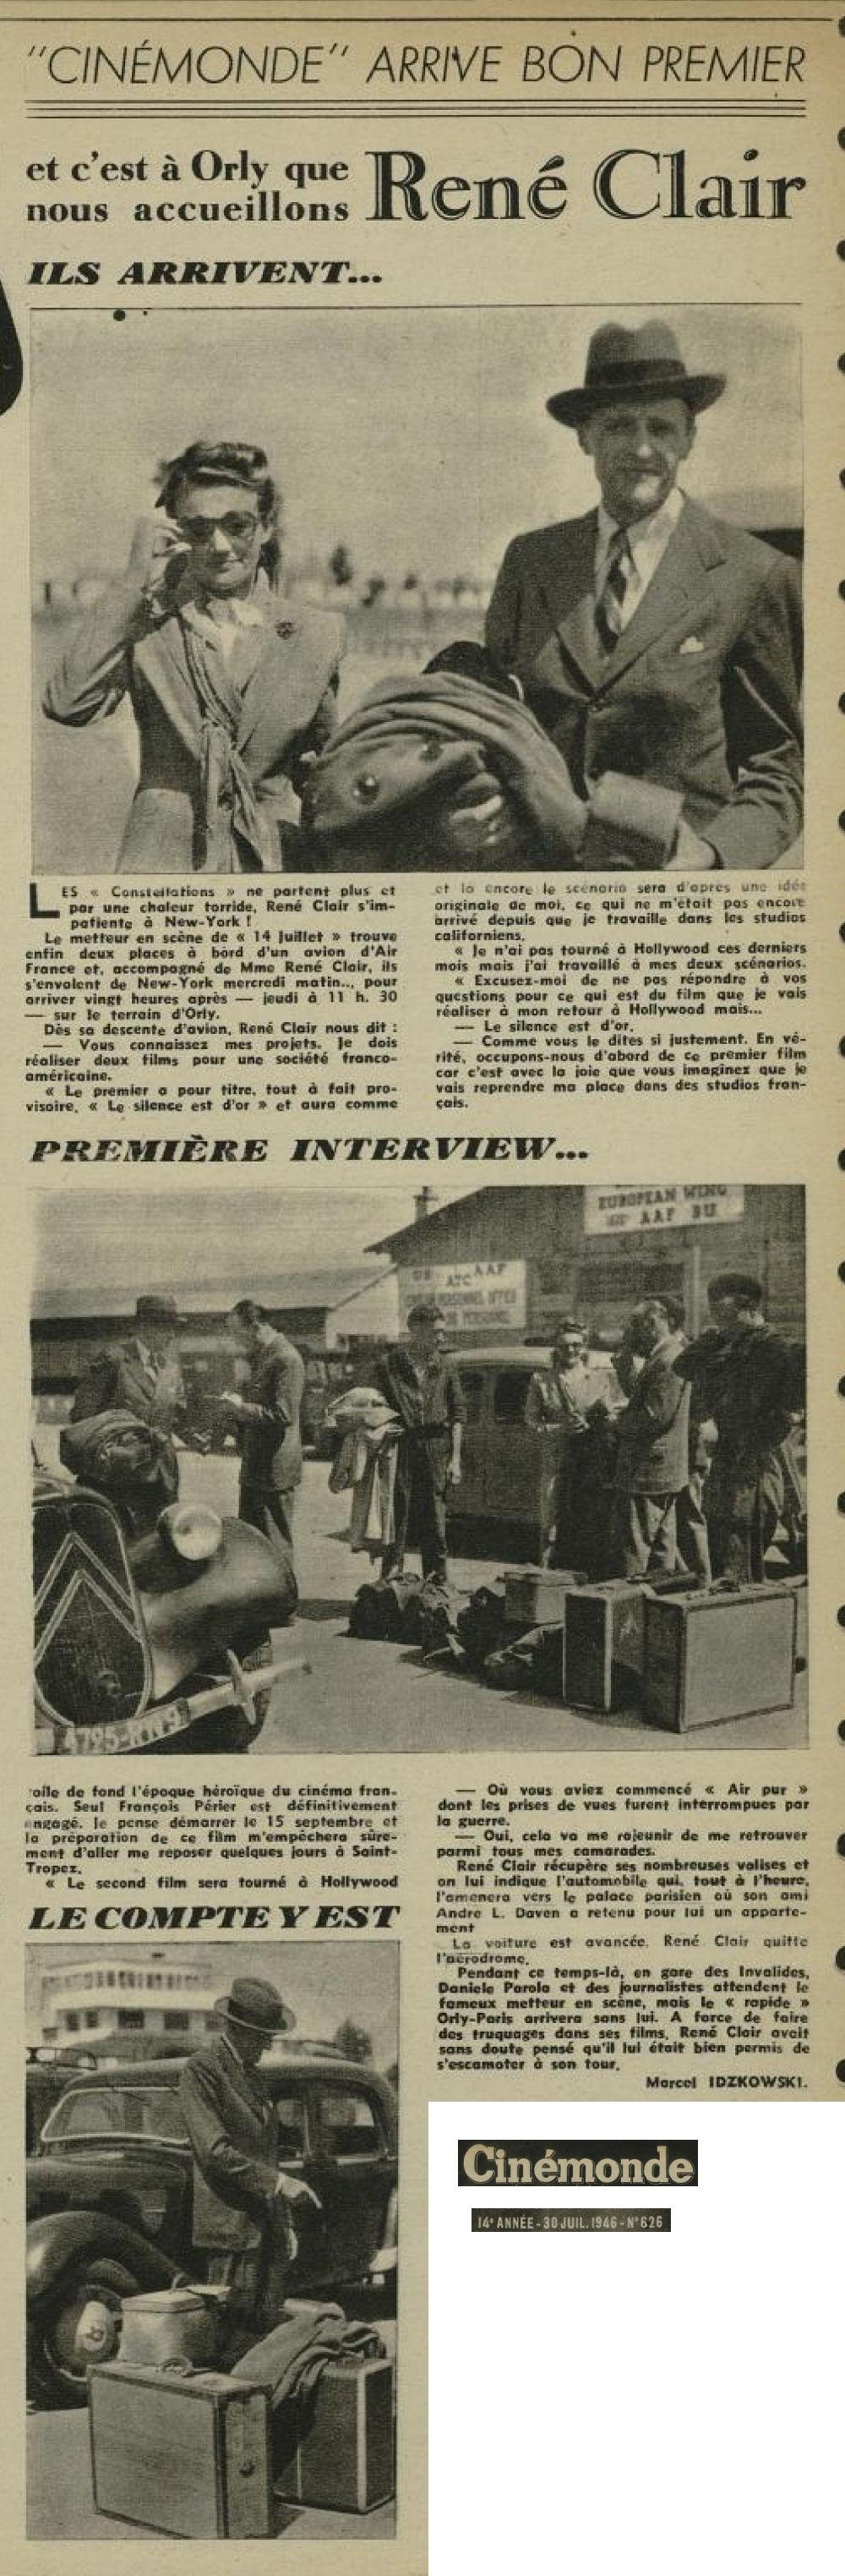 1946 - 30 juillet - Rene Clair